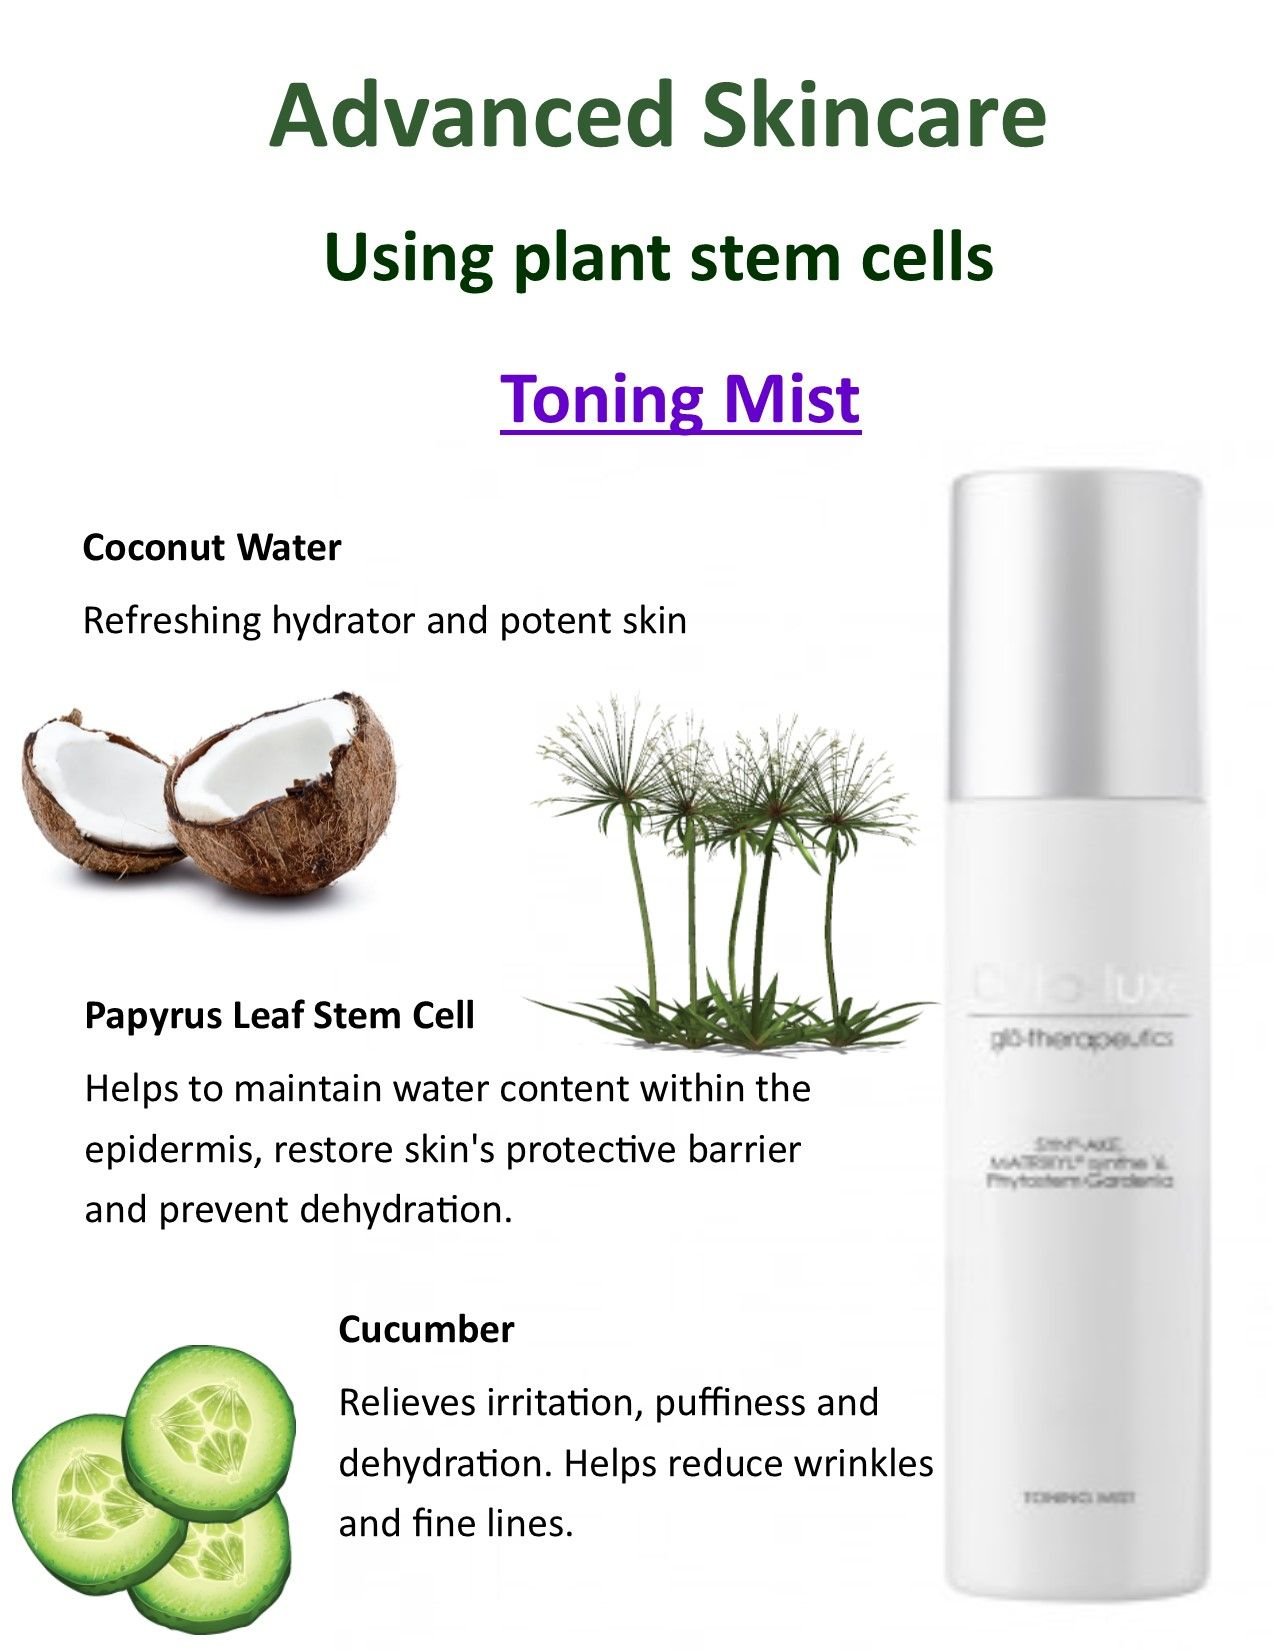 Toning Mist Using Plant Stem Cells